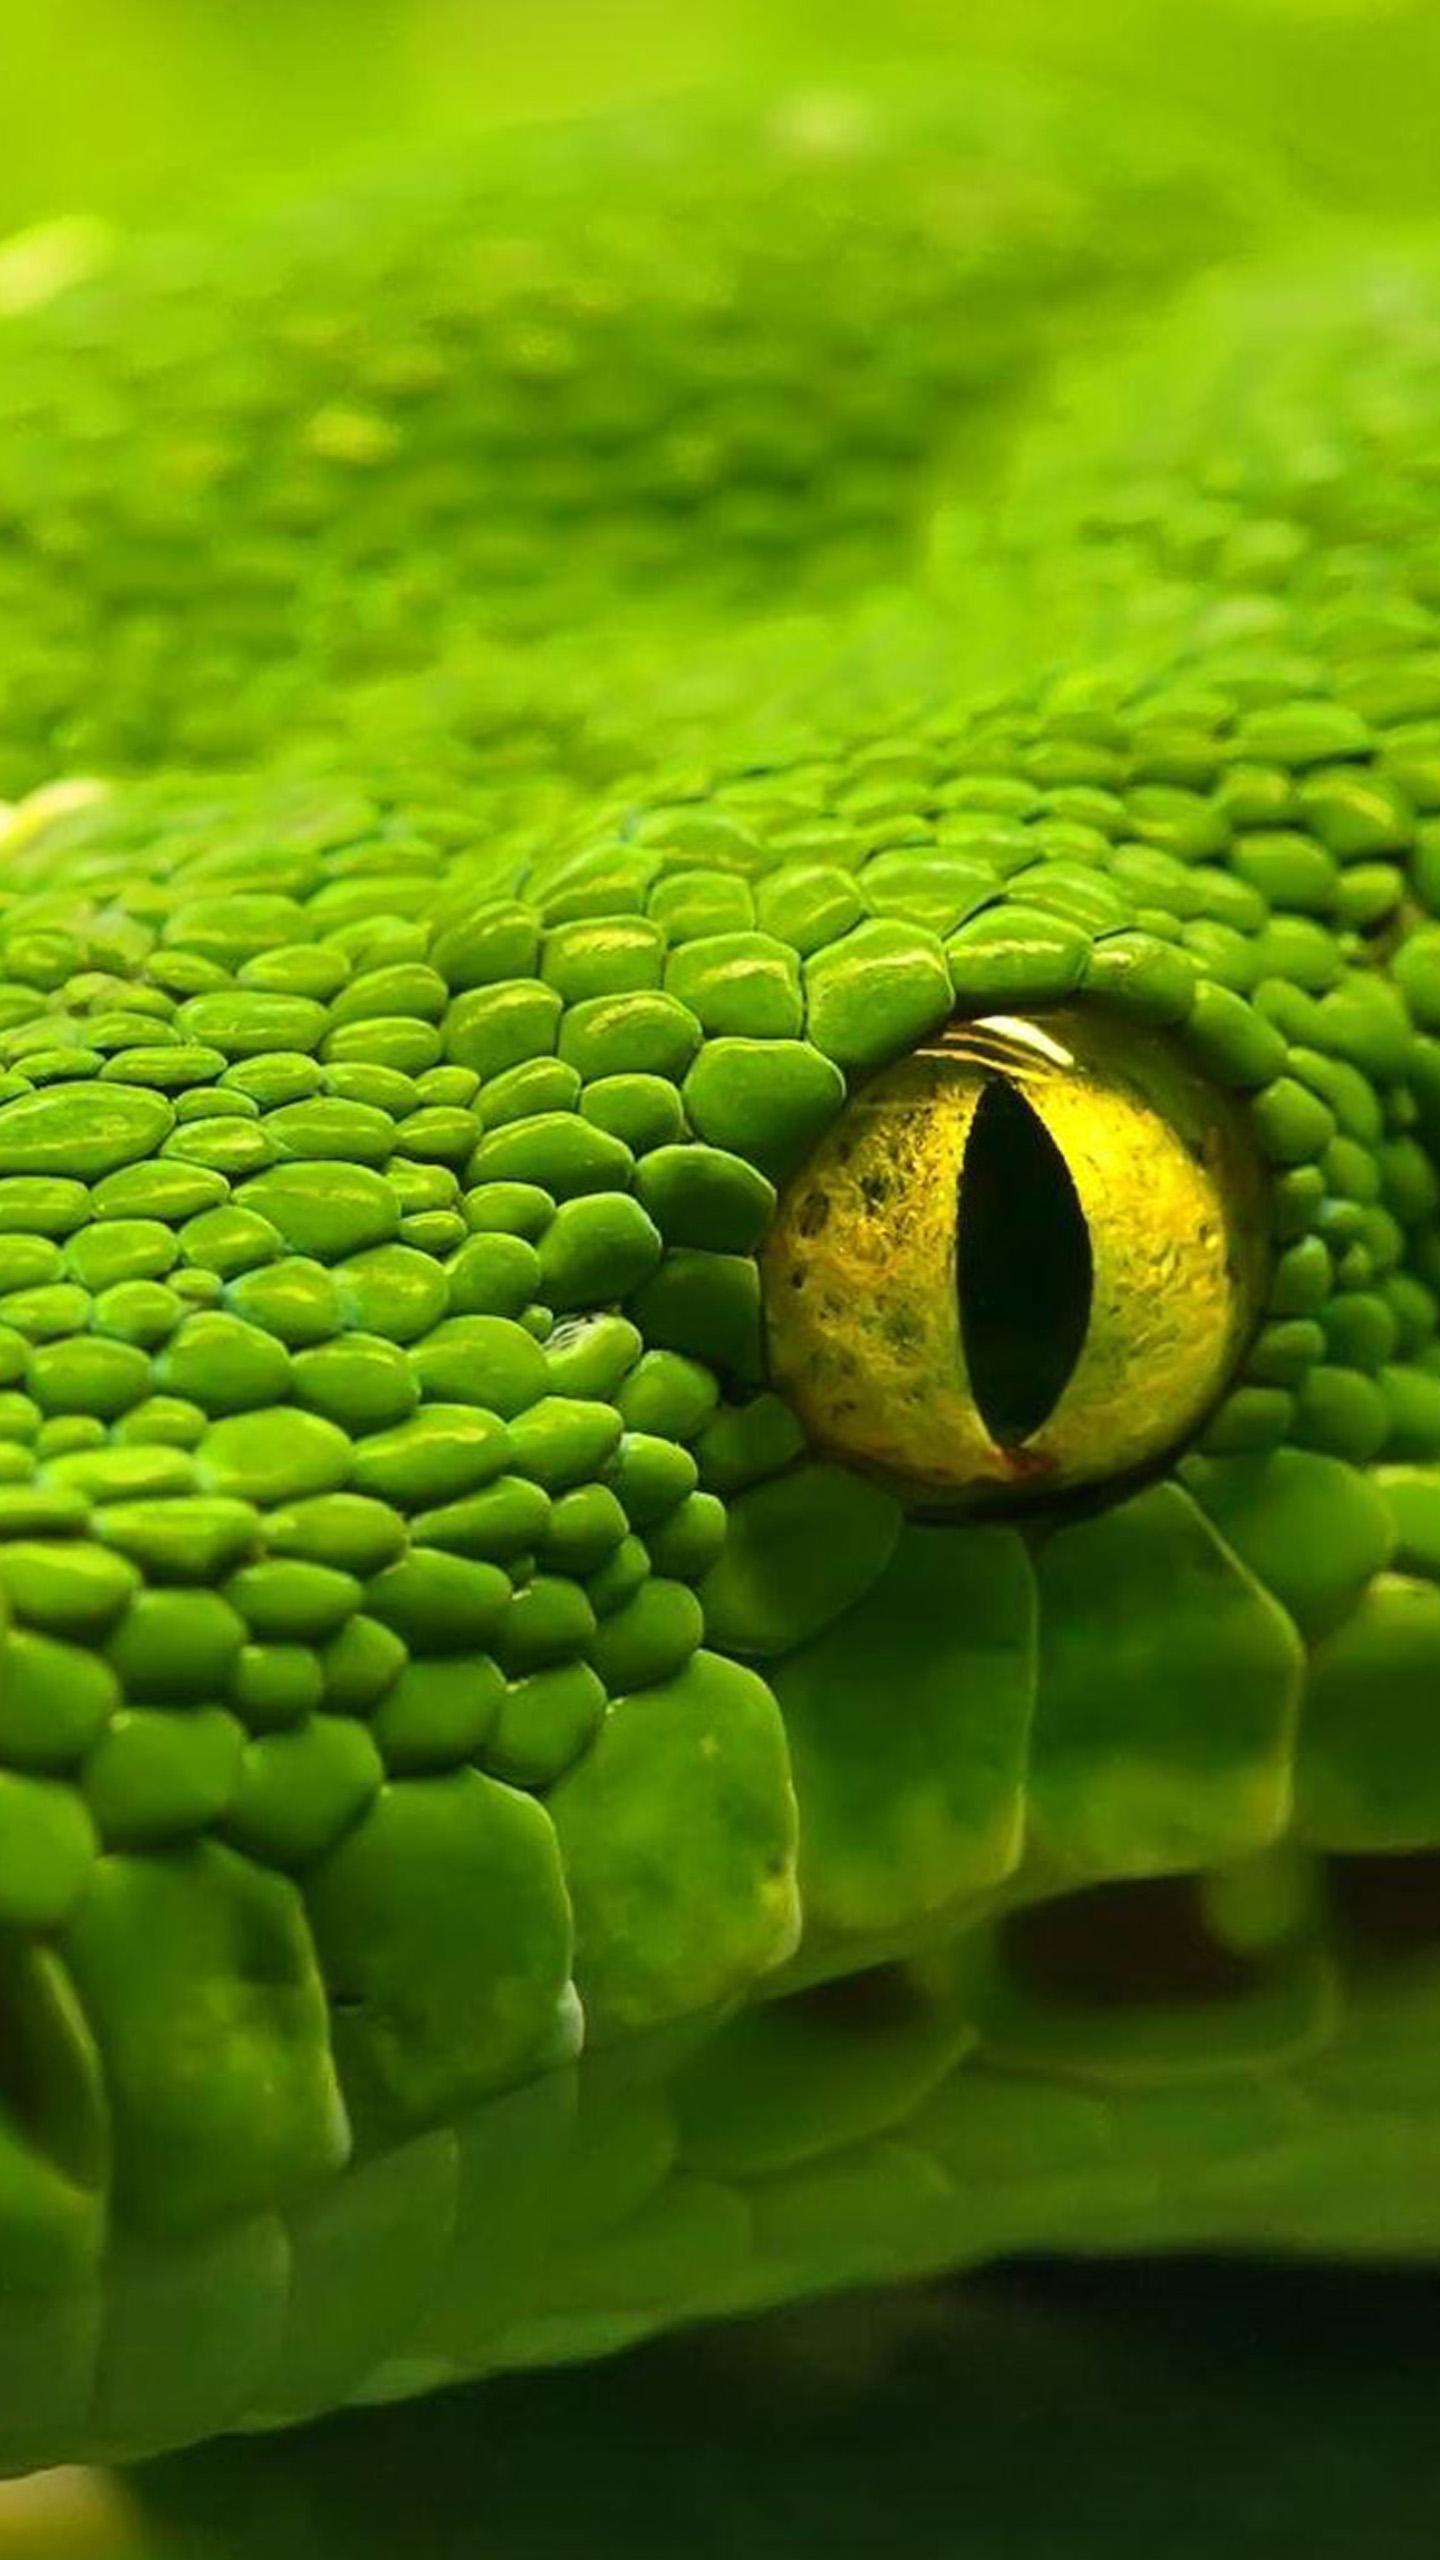 Green Snake Eyes Galaxy S6 Wallpaper Galaxy S6 Wallpapers 1440x2560